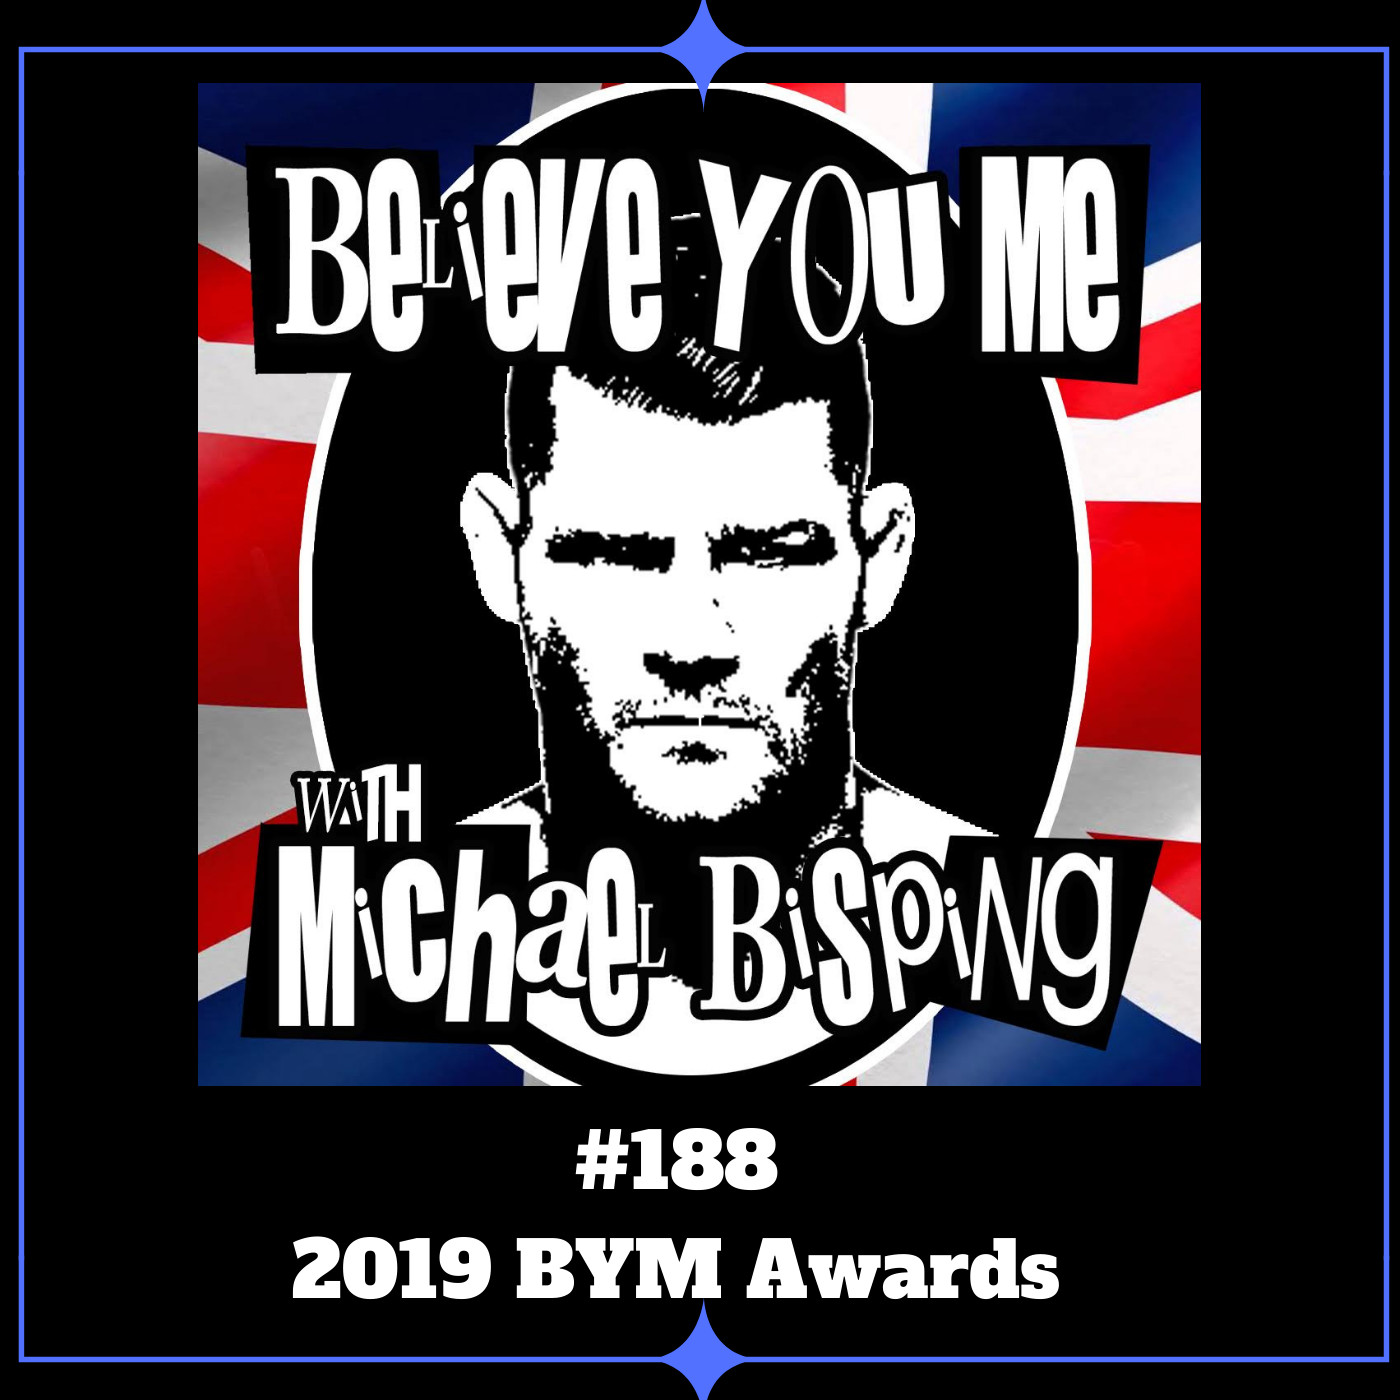 188 - 2019 BYM Awards